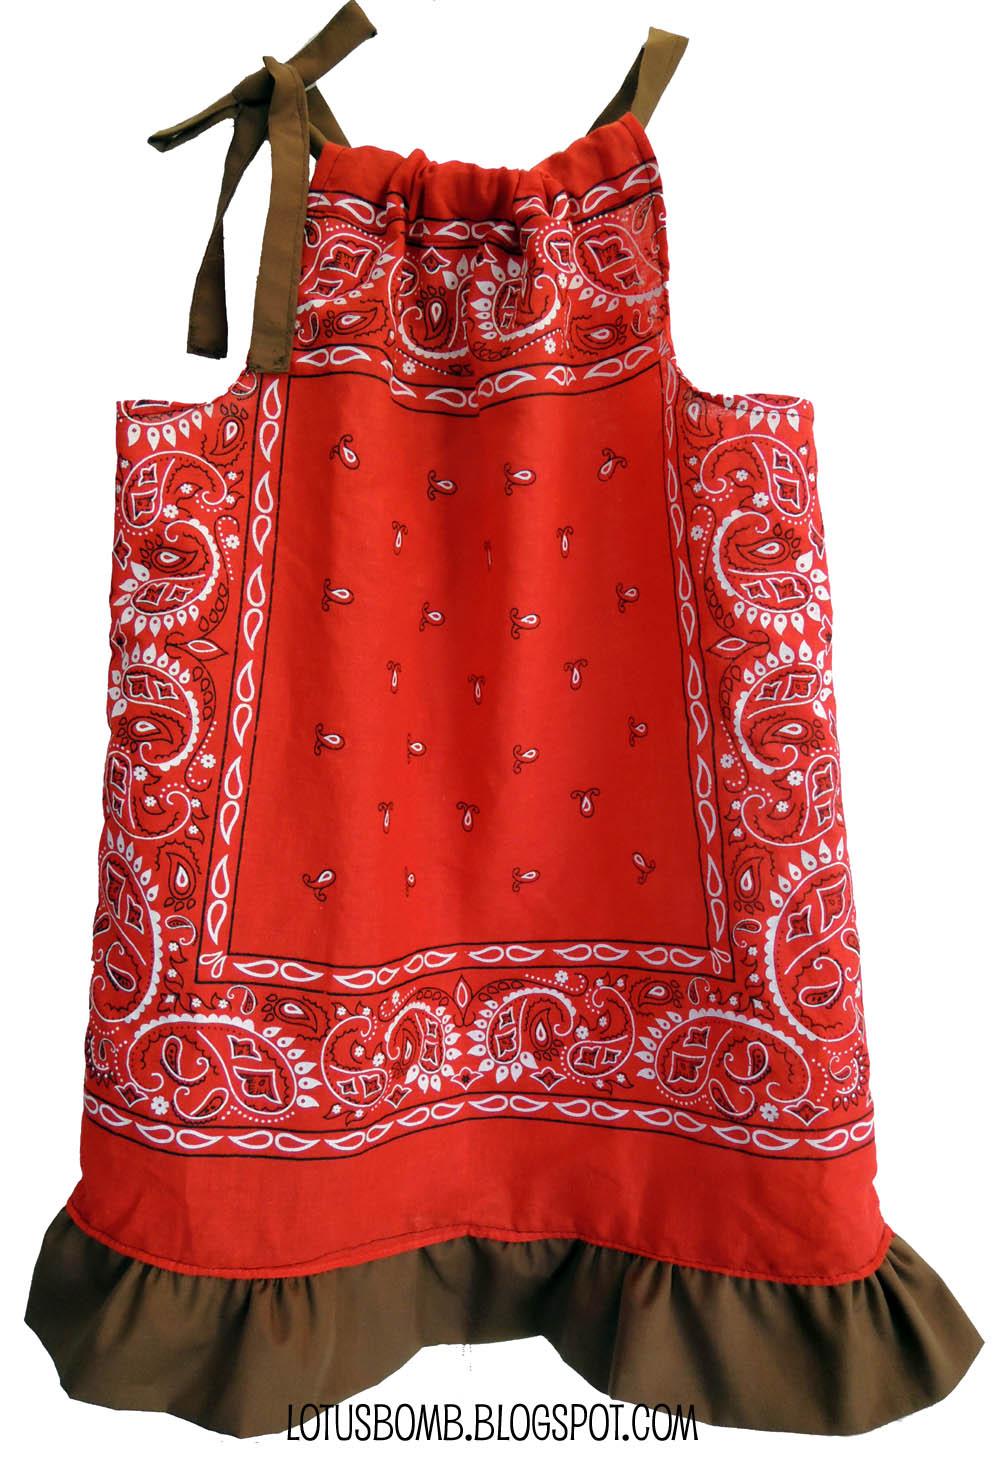 The Crafty World of LotusBomb: Day 1 - Pinterest 30 Day Craft Challenge - Bandana Pillowcase Dress